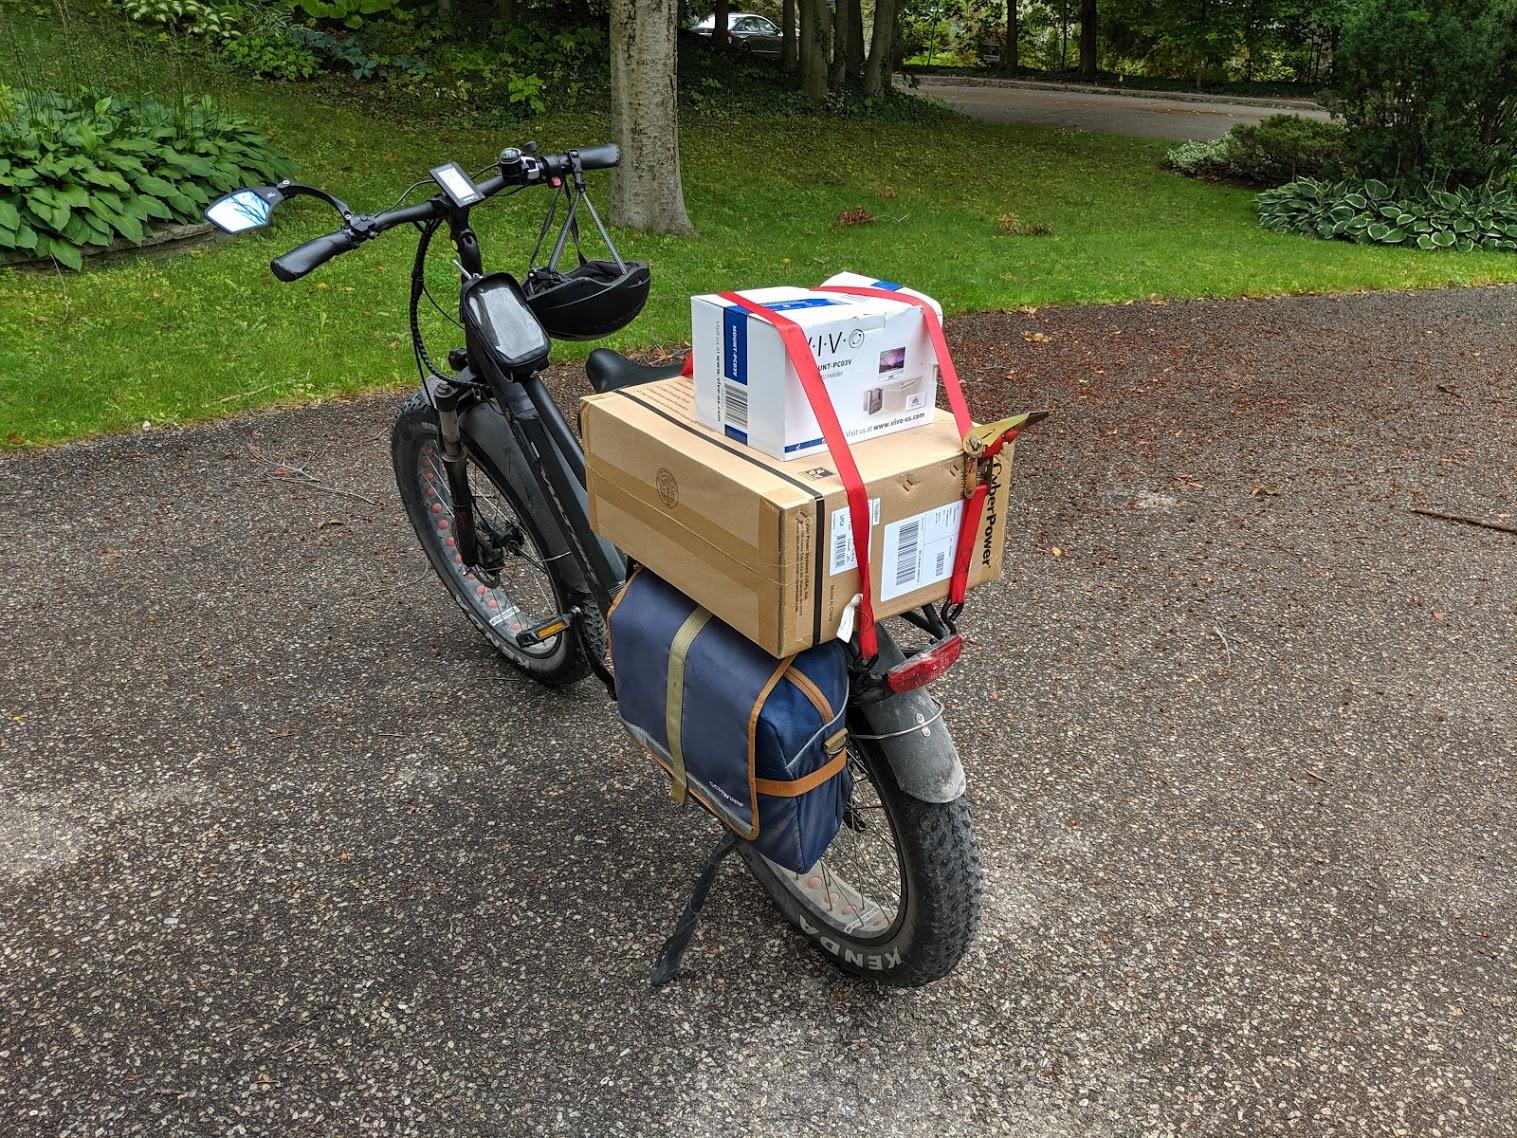 e-bikes and UPS: no, not really